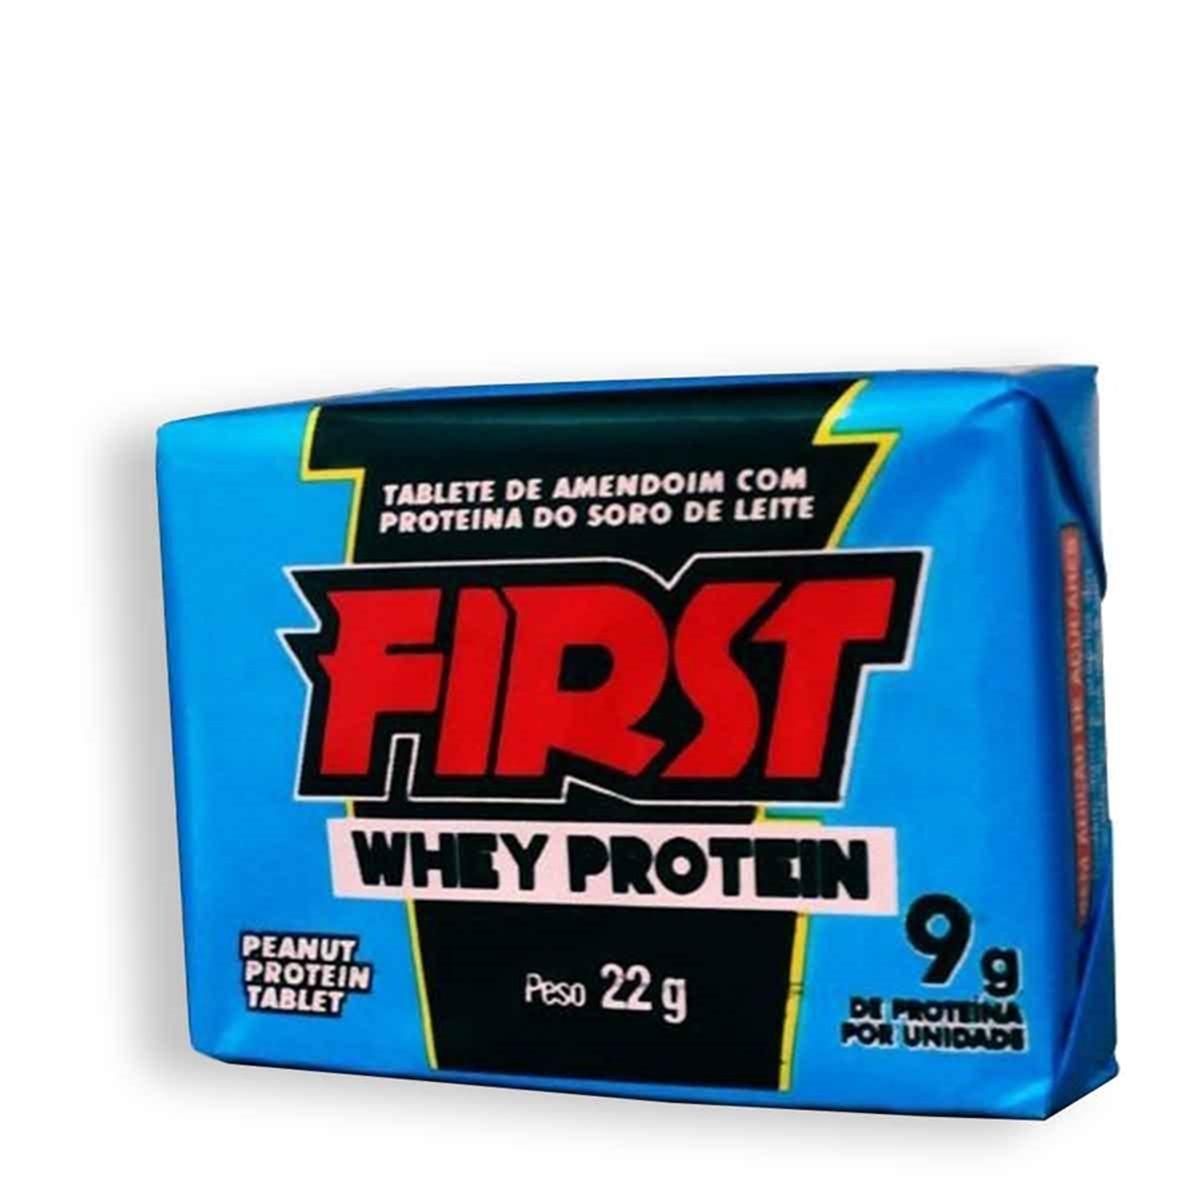 Paçoca First Whey Protein 22gr C/24un - Santa Helena